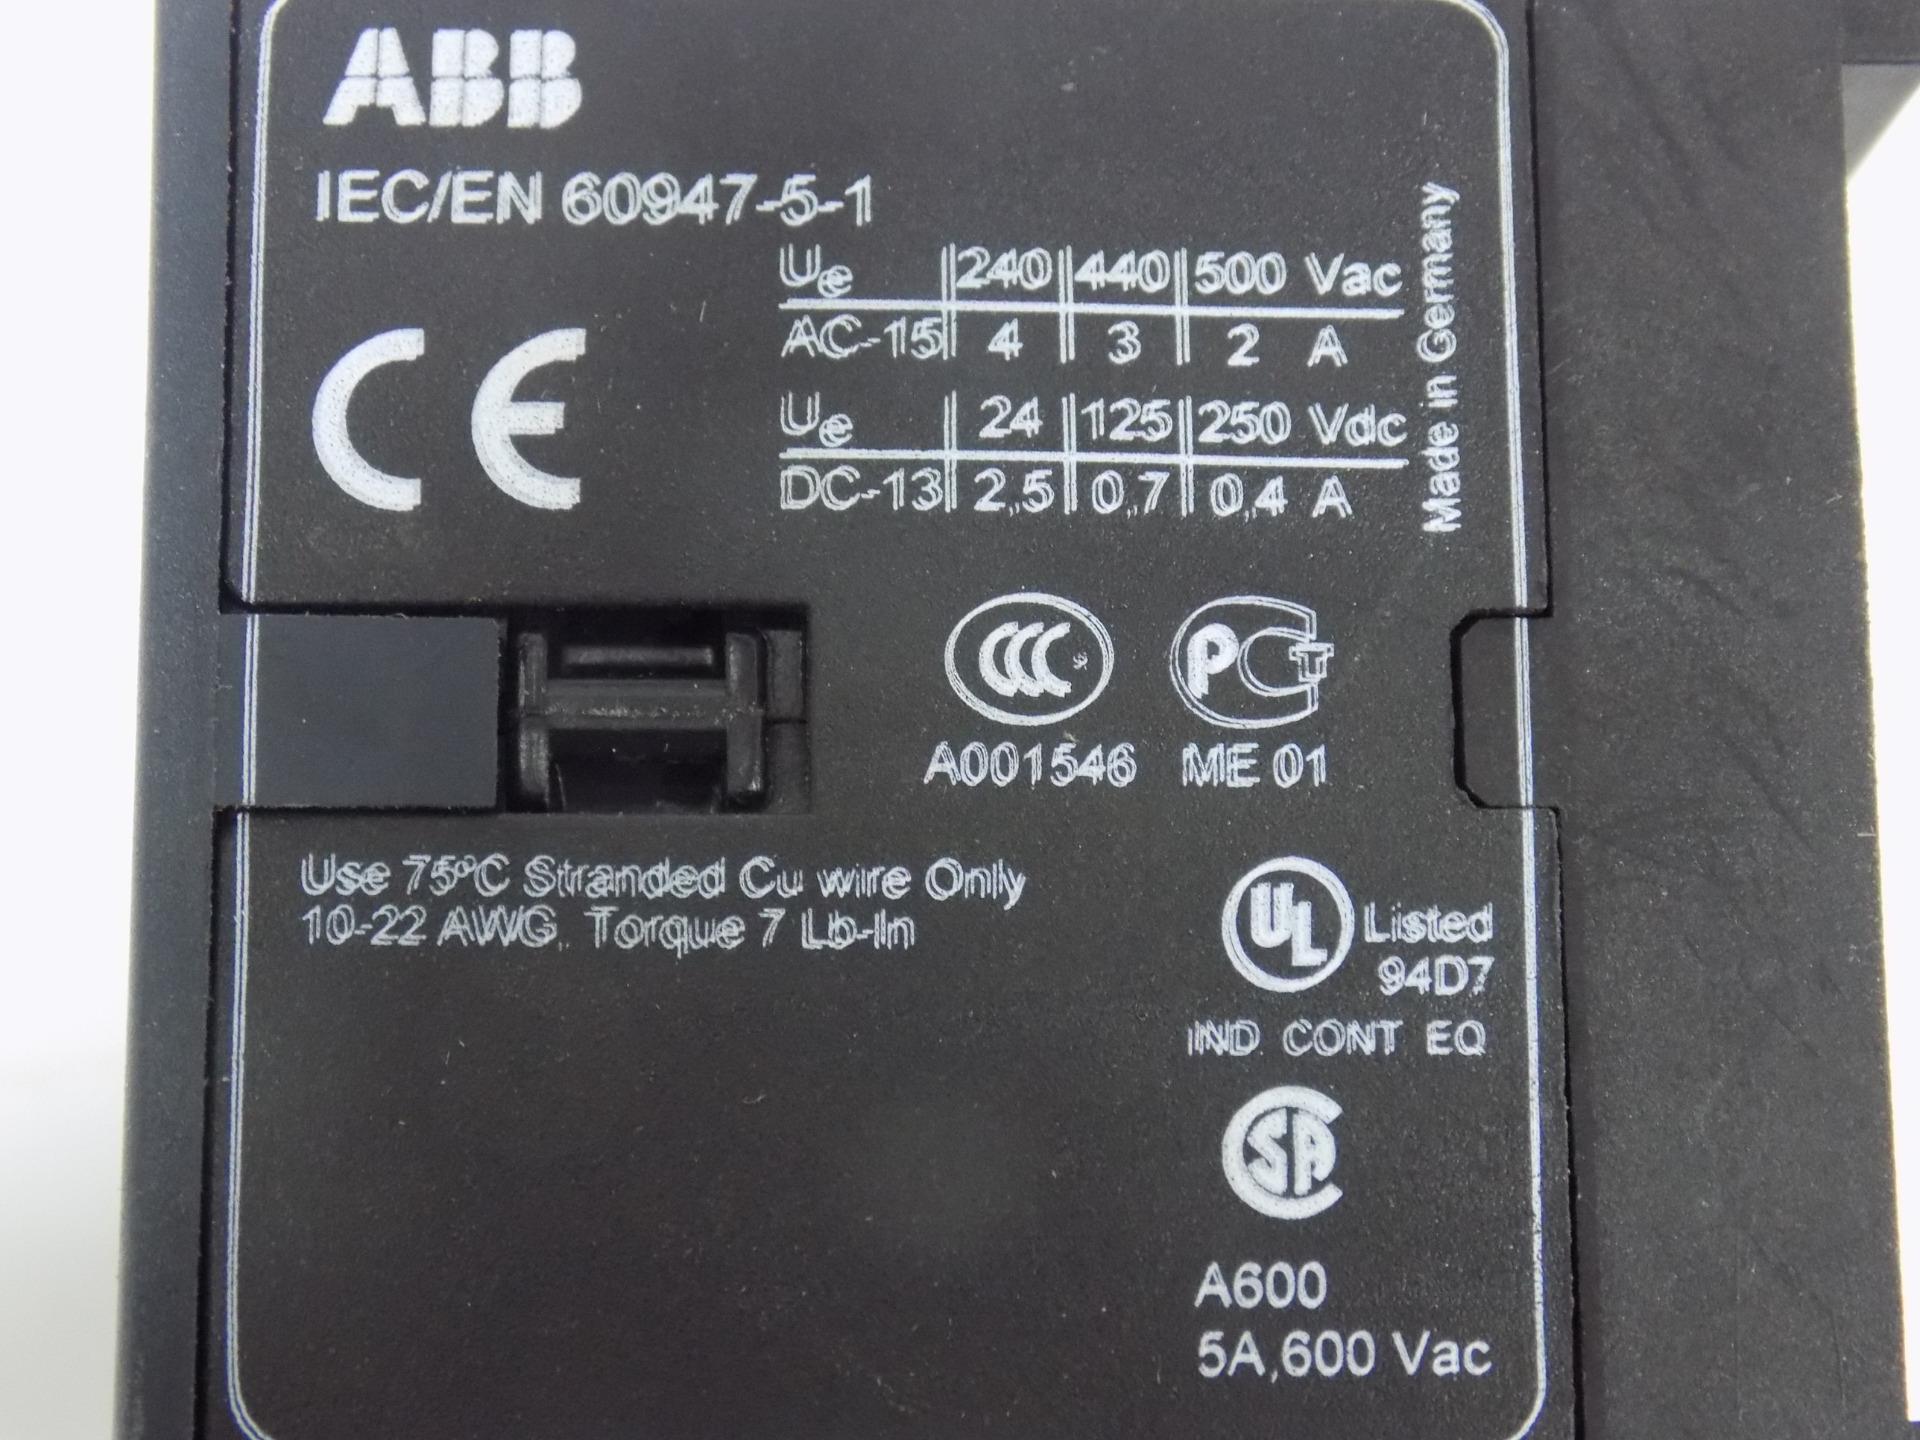 Abb Relay Kc6 22z Ebay Solid State Z240d10 Lsjch07052017 Shelf51 18192 Jobcodemk60117